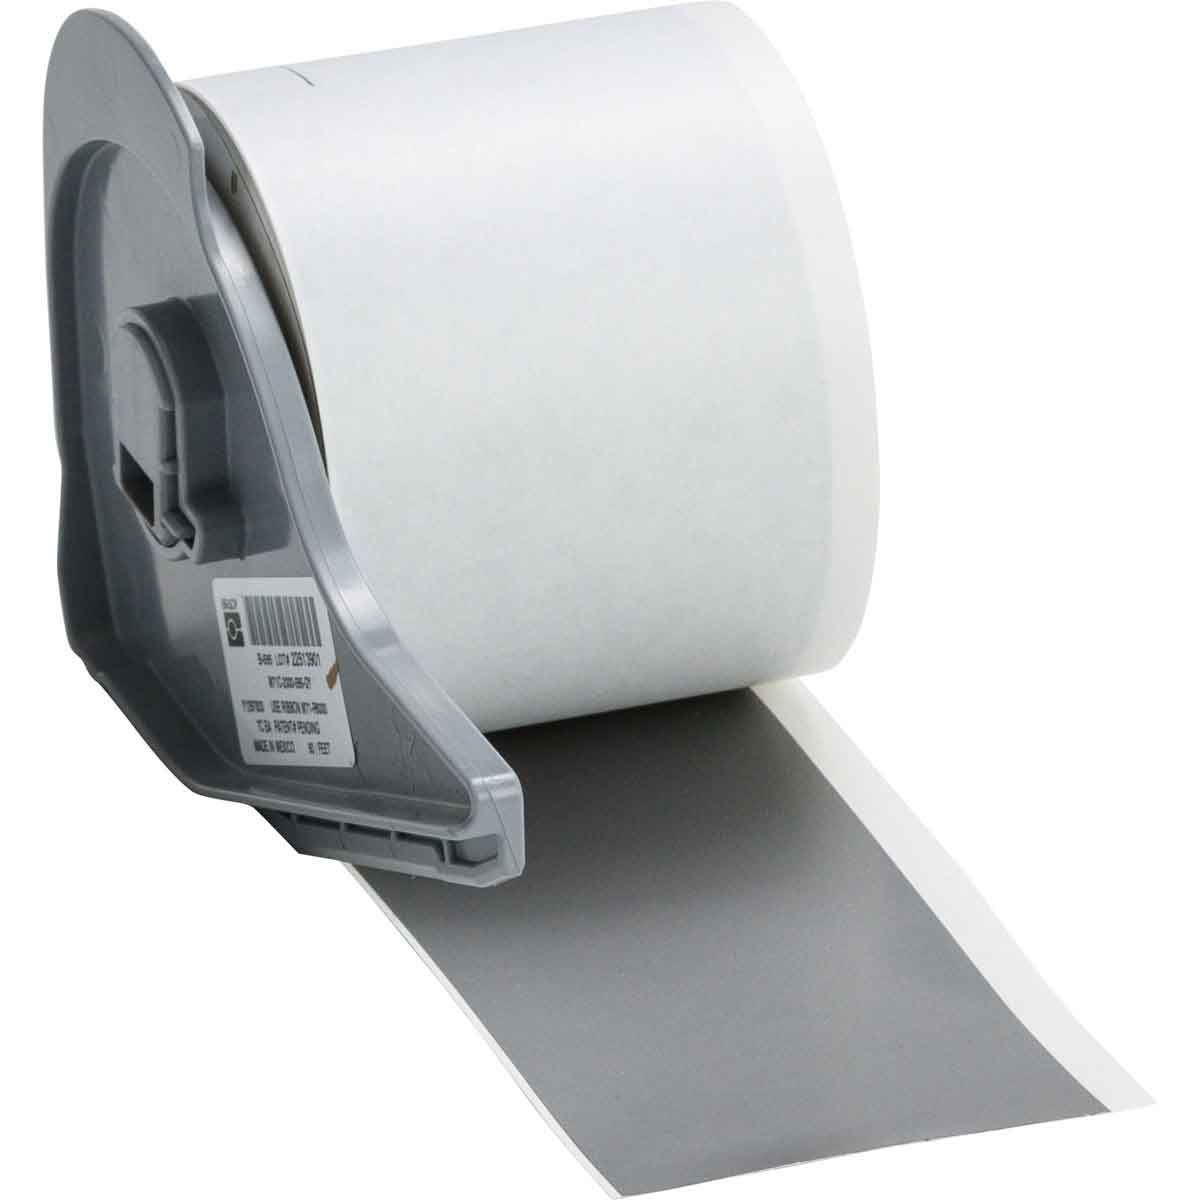 Brady® M71C-2000-595-GY Blank Thermal Transfer Tape, 50 ft L x 2 in W, Gray, B-595 Vinyl, Permanent Acrylic Adhesive, -40 to 180 deg F